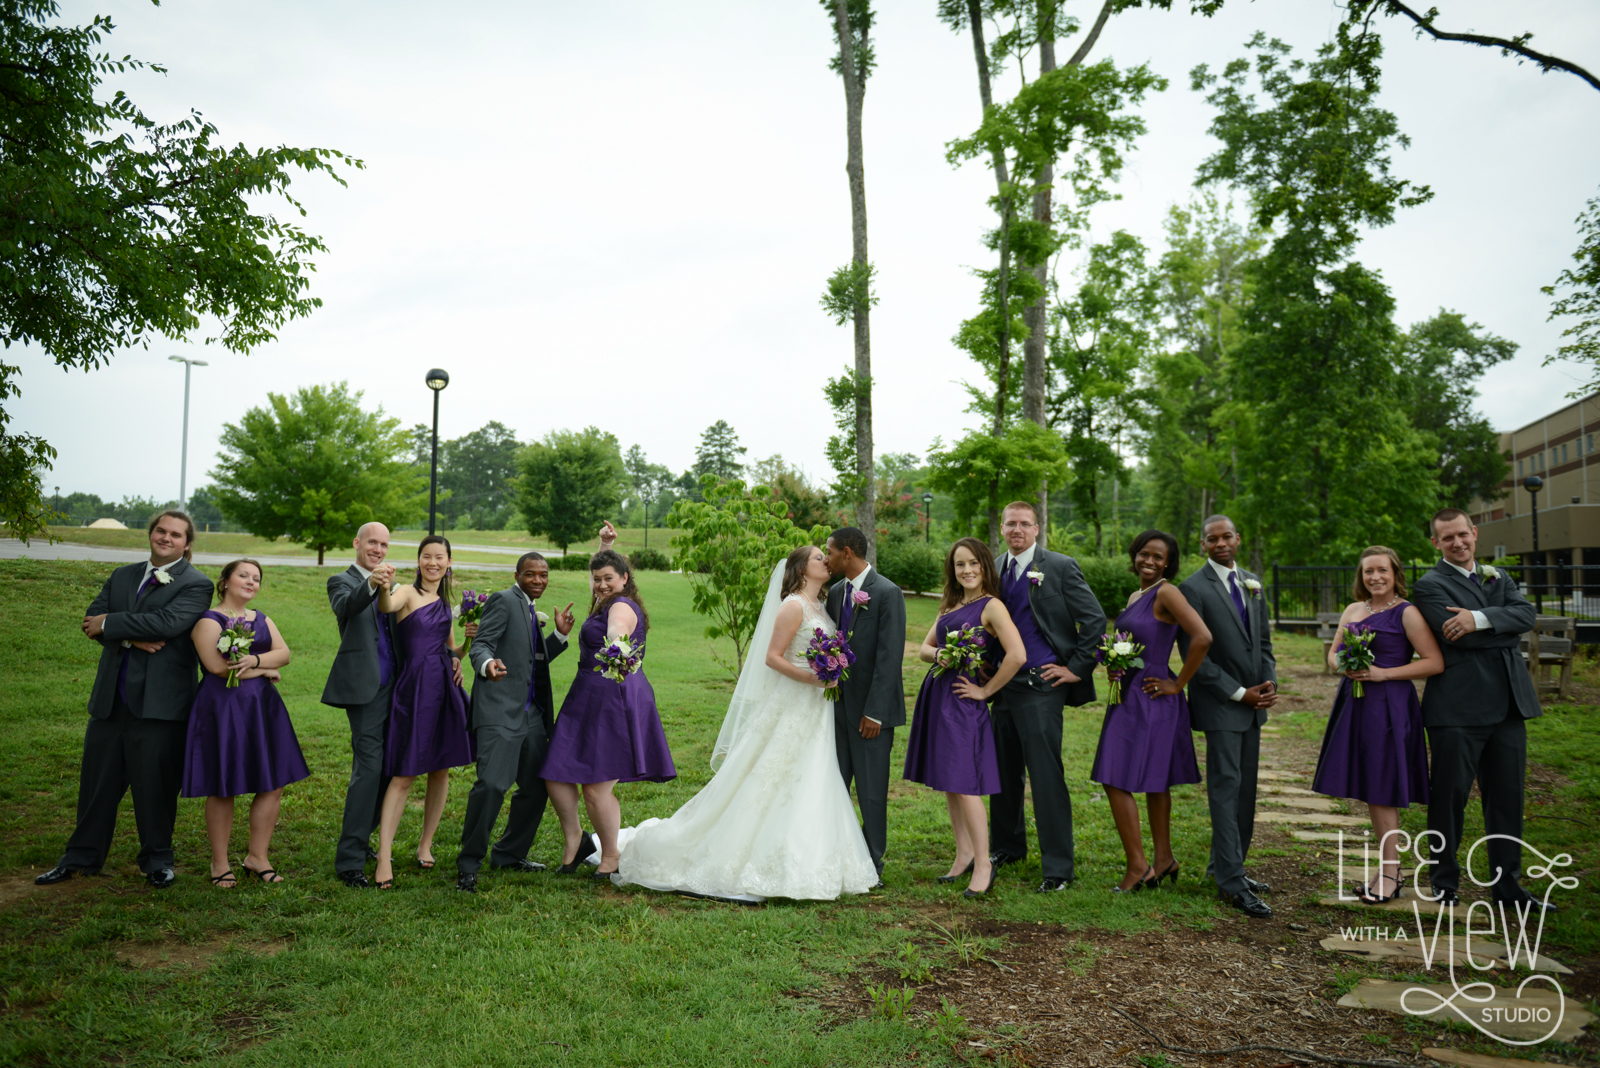 Hooper-Wedding-60.jpg